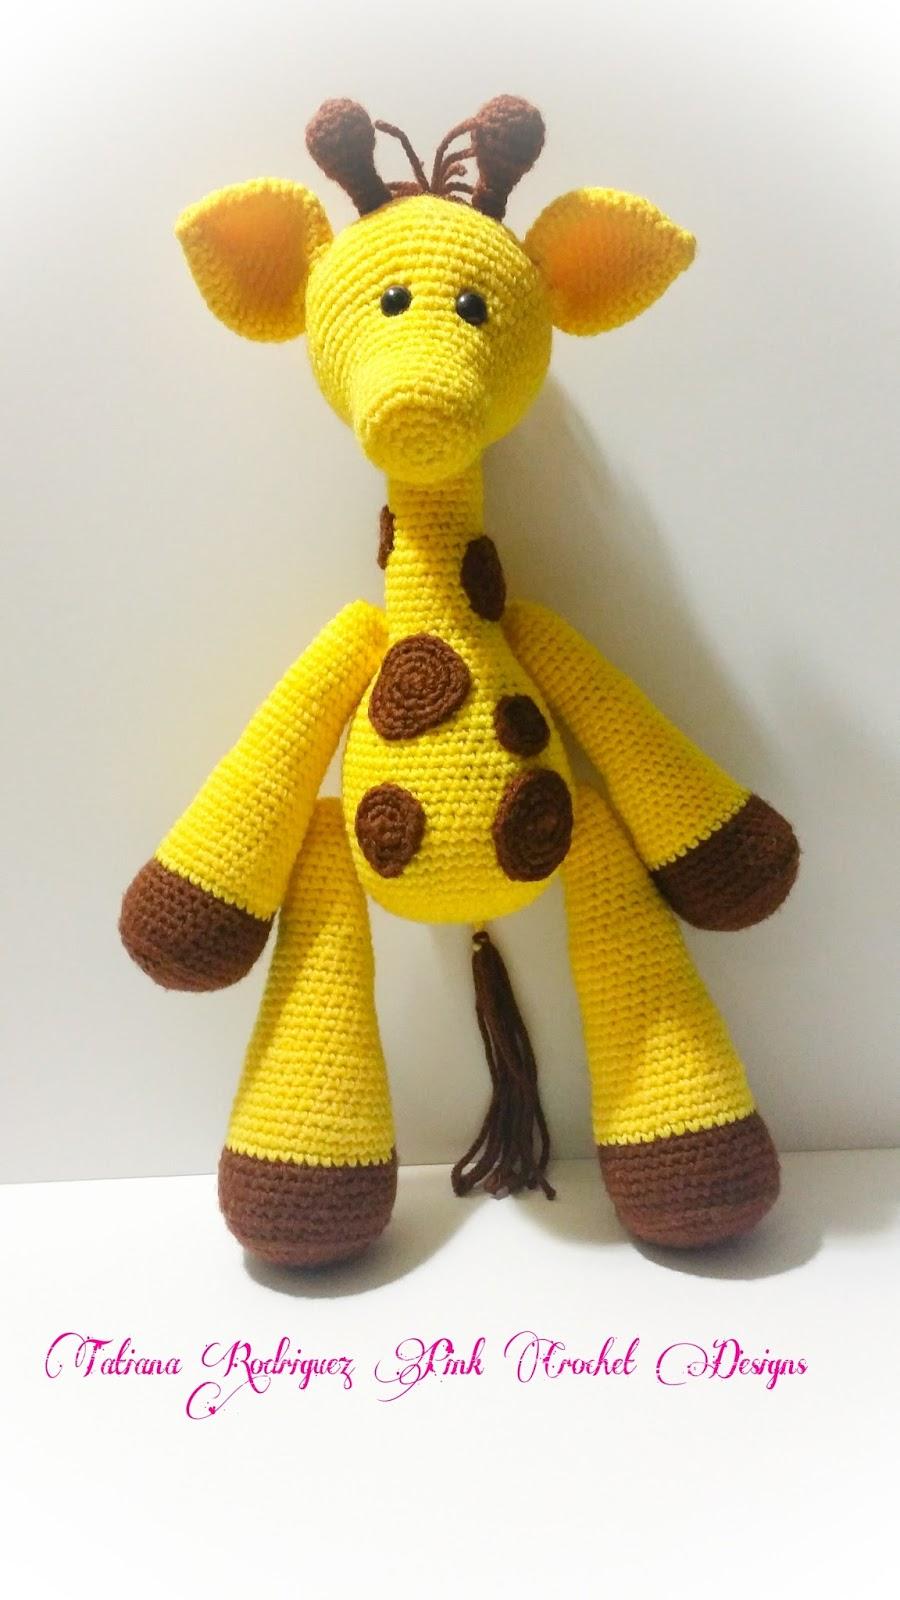 Tatiana Rodriguez\'s Pink Crochet Designs: Joey The Giraffe Now ...